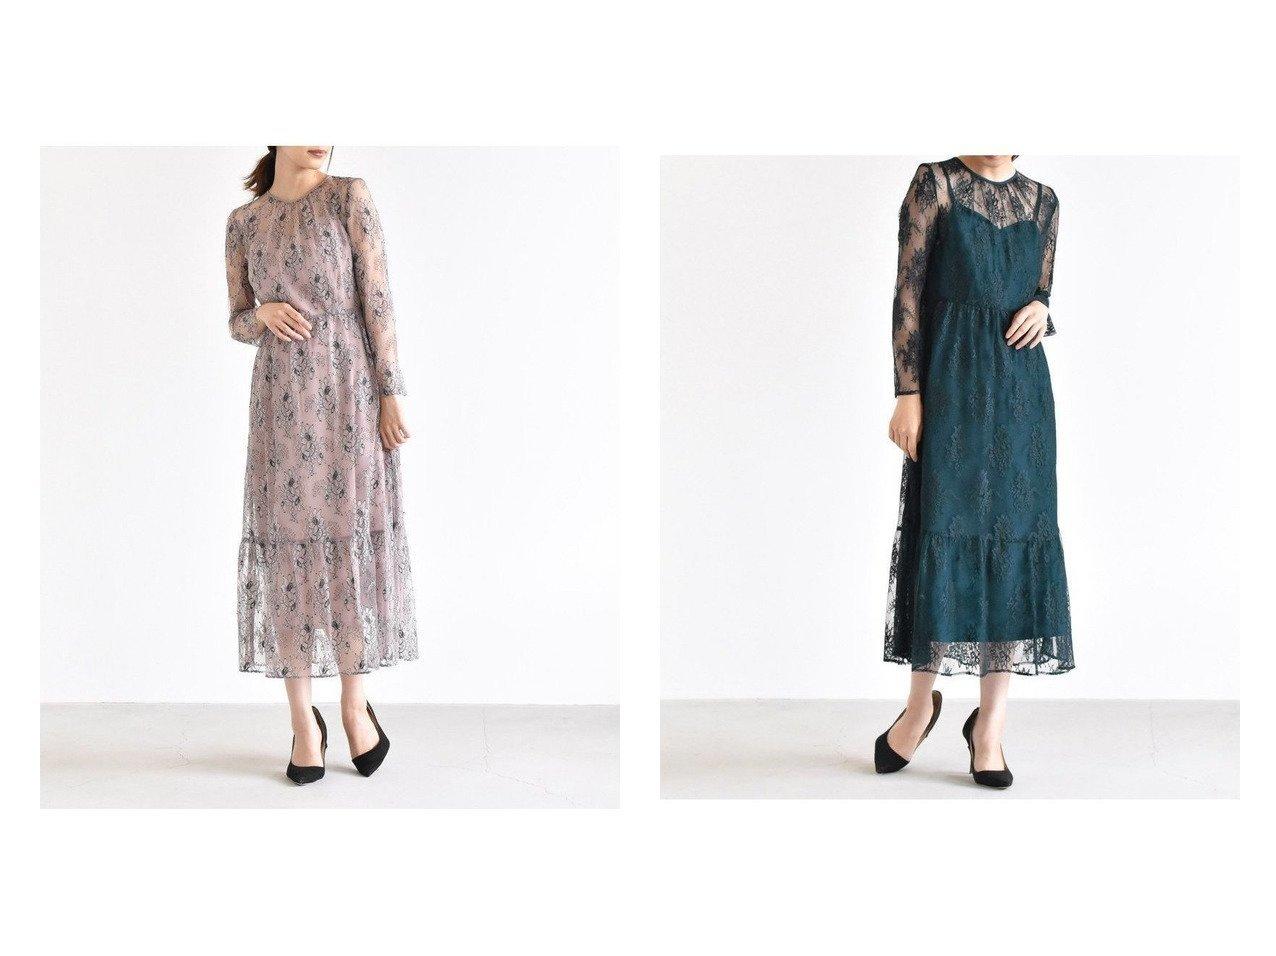 【Kaene/カエン】のオールレースワンピース 【ワンピース・ドレス】おすすめ!人気、トレンド・レディースファッションの通販 おすすめで人気の流行・トレンド、ファッションの通販商品 メンズファッション・キッズファッション・インテリア・家具・レディースファッション・服の通販 founy(ファニー) https://founy.com/ ファッション Fashion レディースファッション WOMEN ワンピース Dress レース 長袖 |ID:crp329100000029861